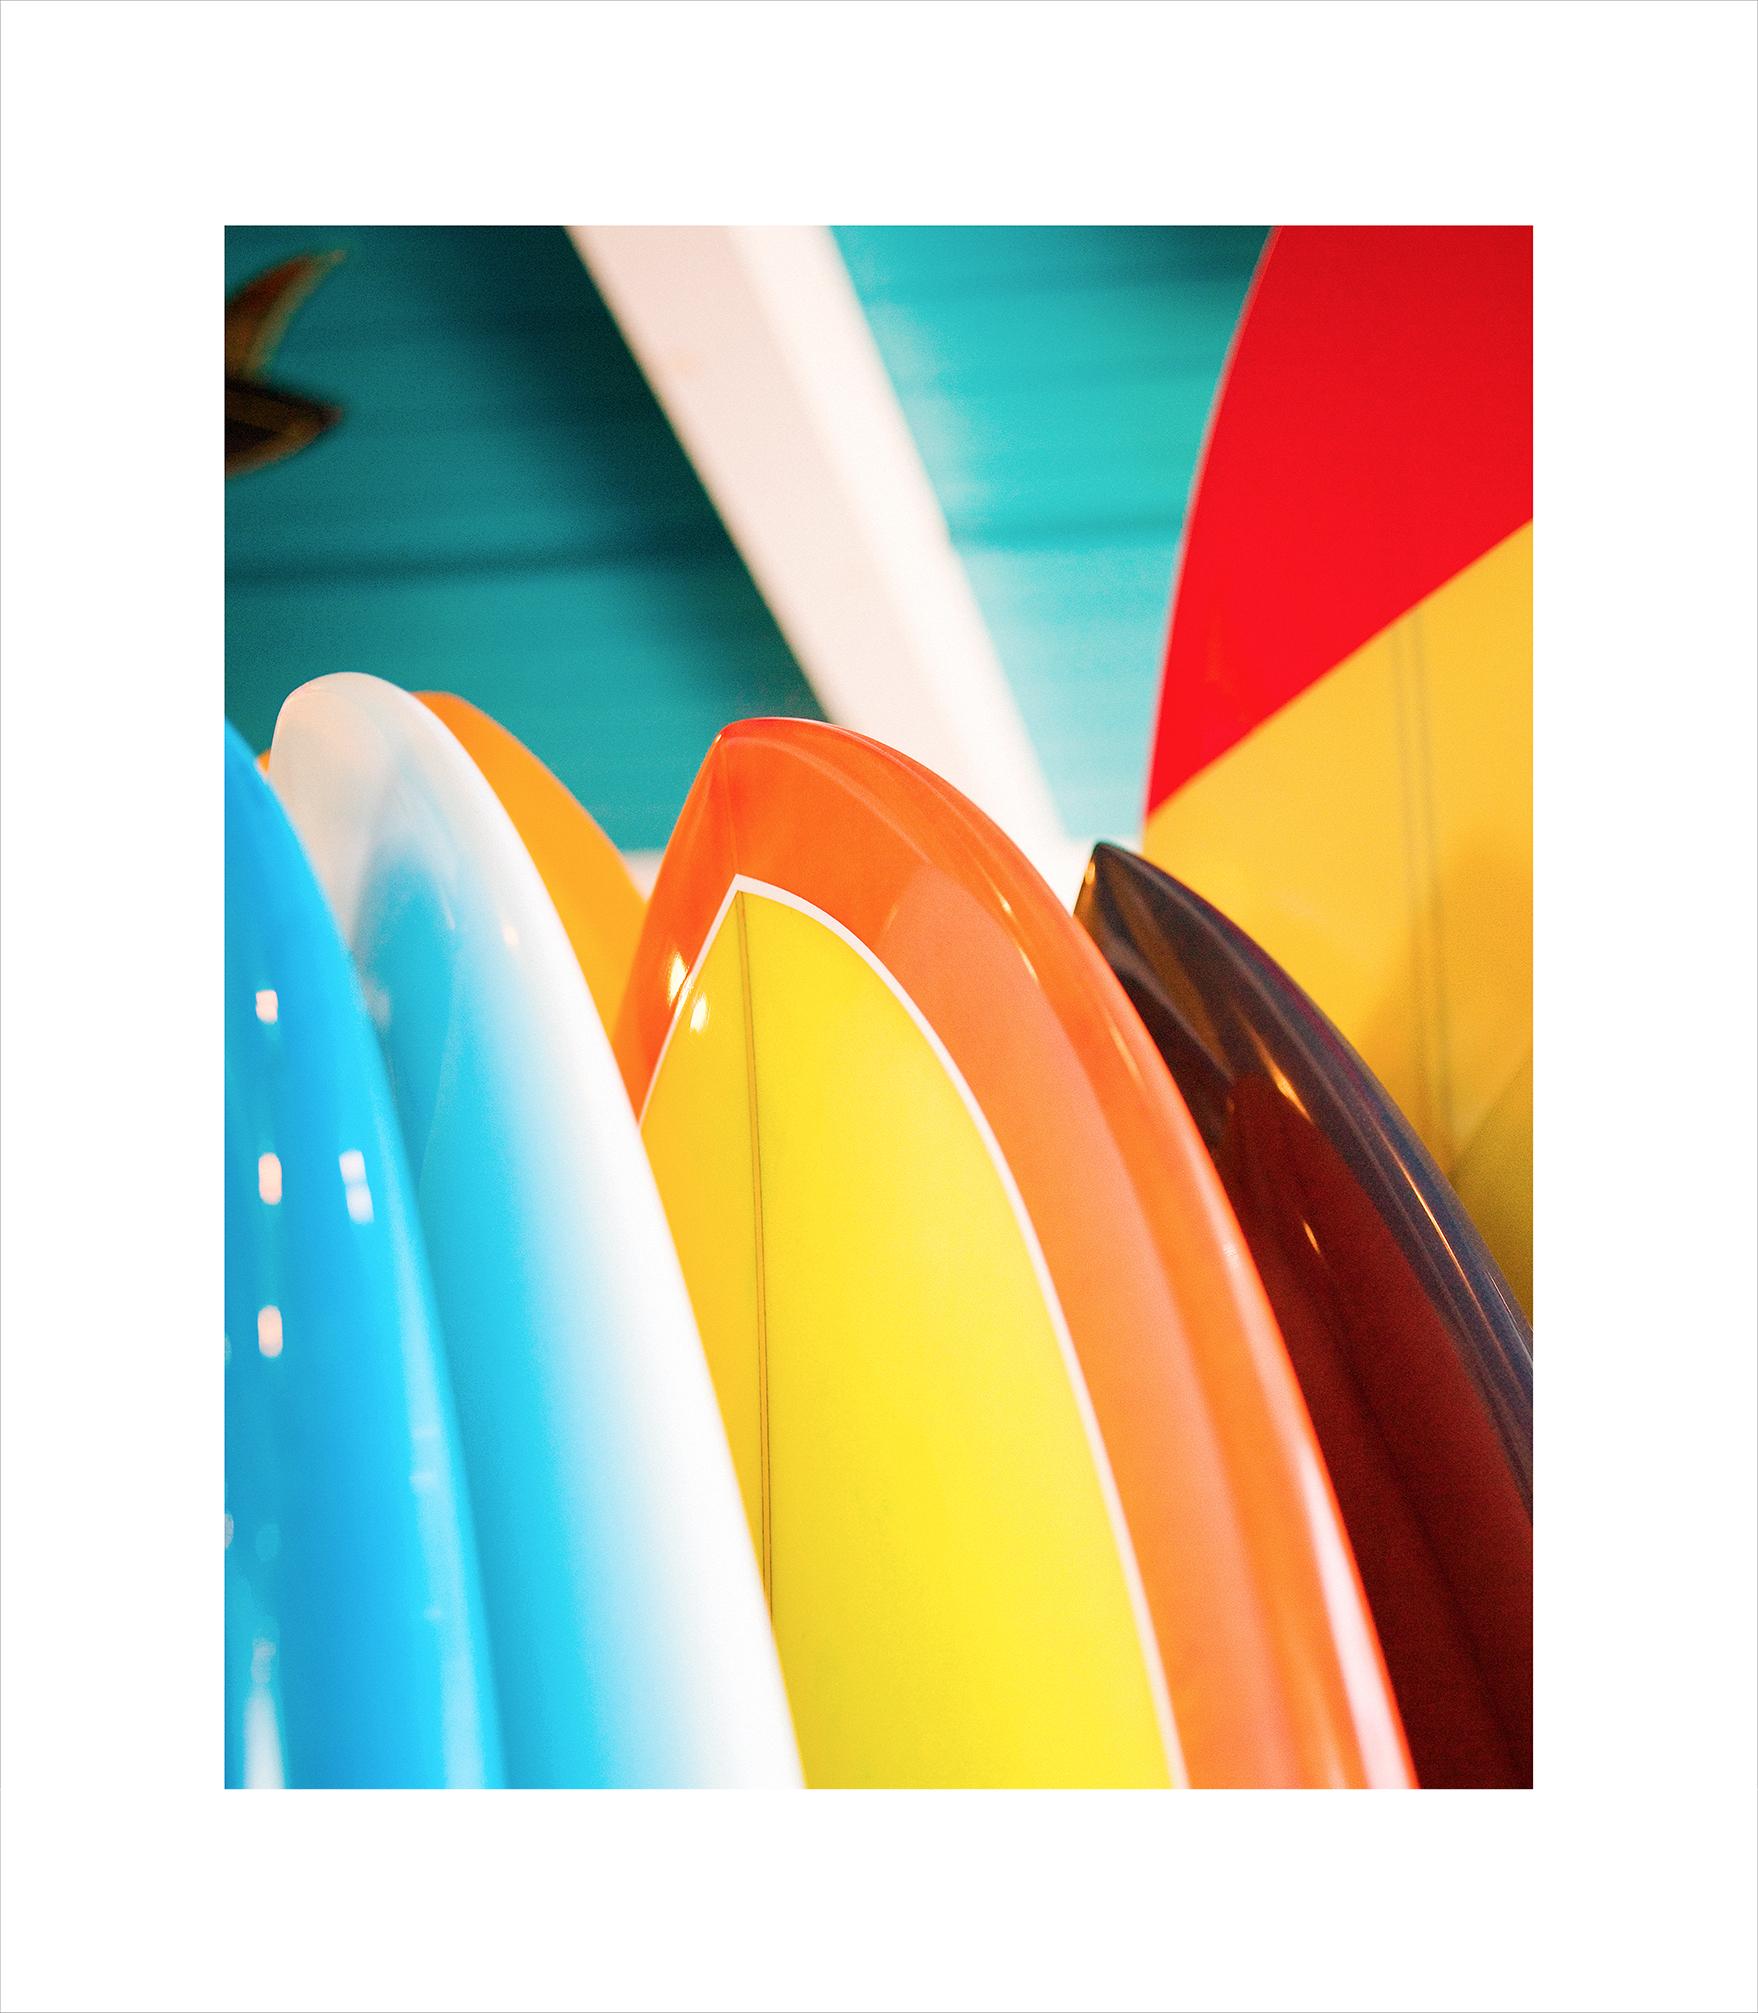 JP GREENWOOD_SURFBOARDS_PRINT ONLY.jpg